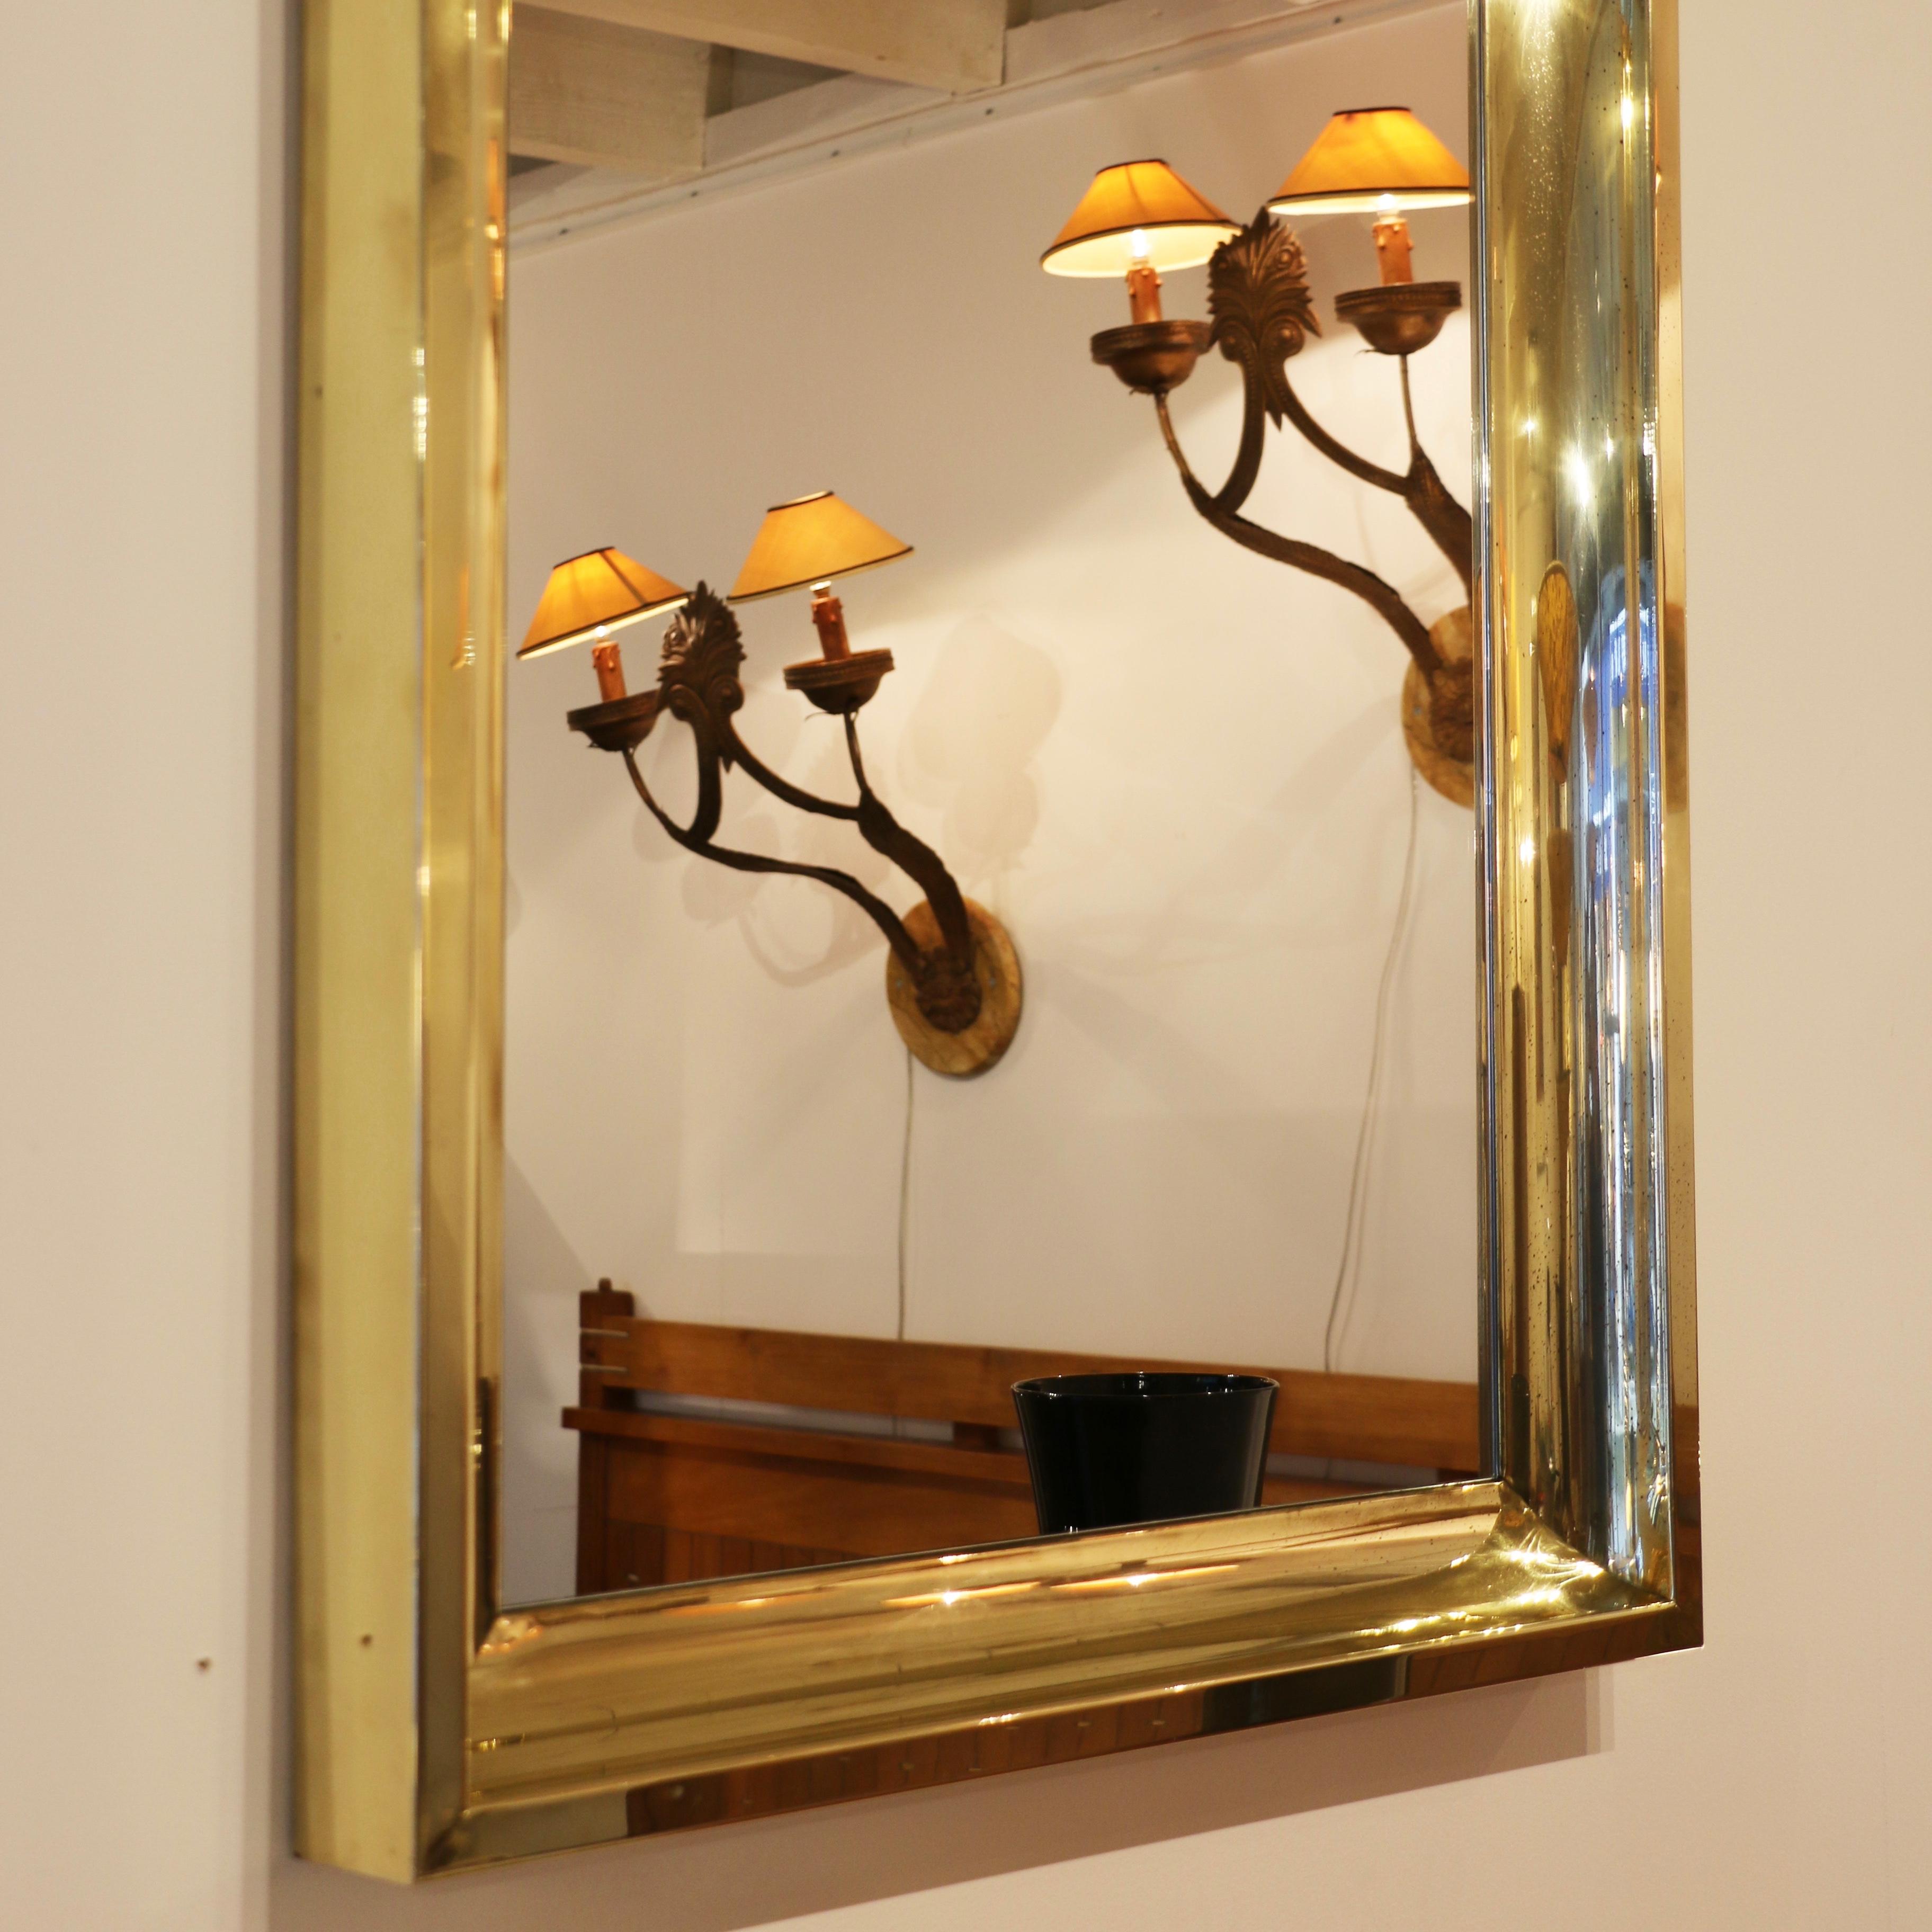 /57/Johnston 39/37 81 Verre Miroir Miroir ext/érieur gauche/